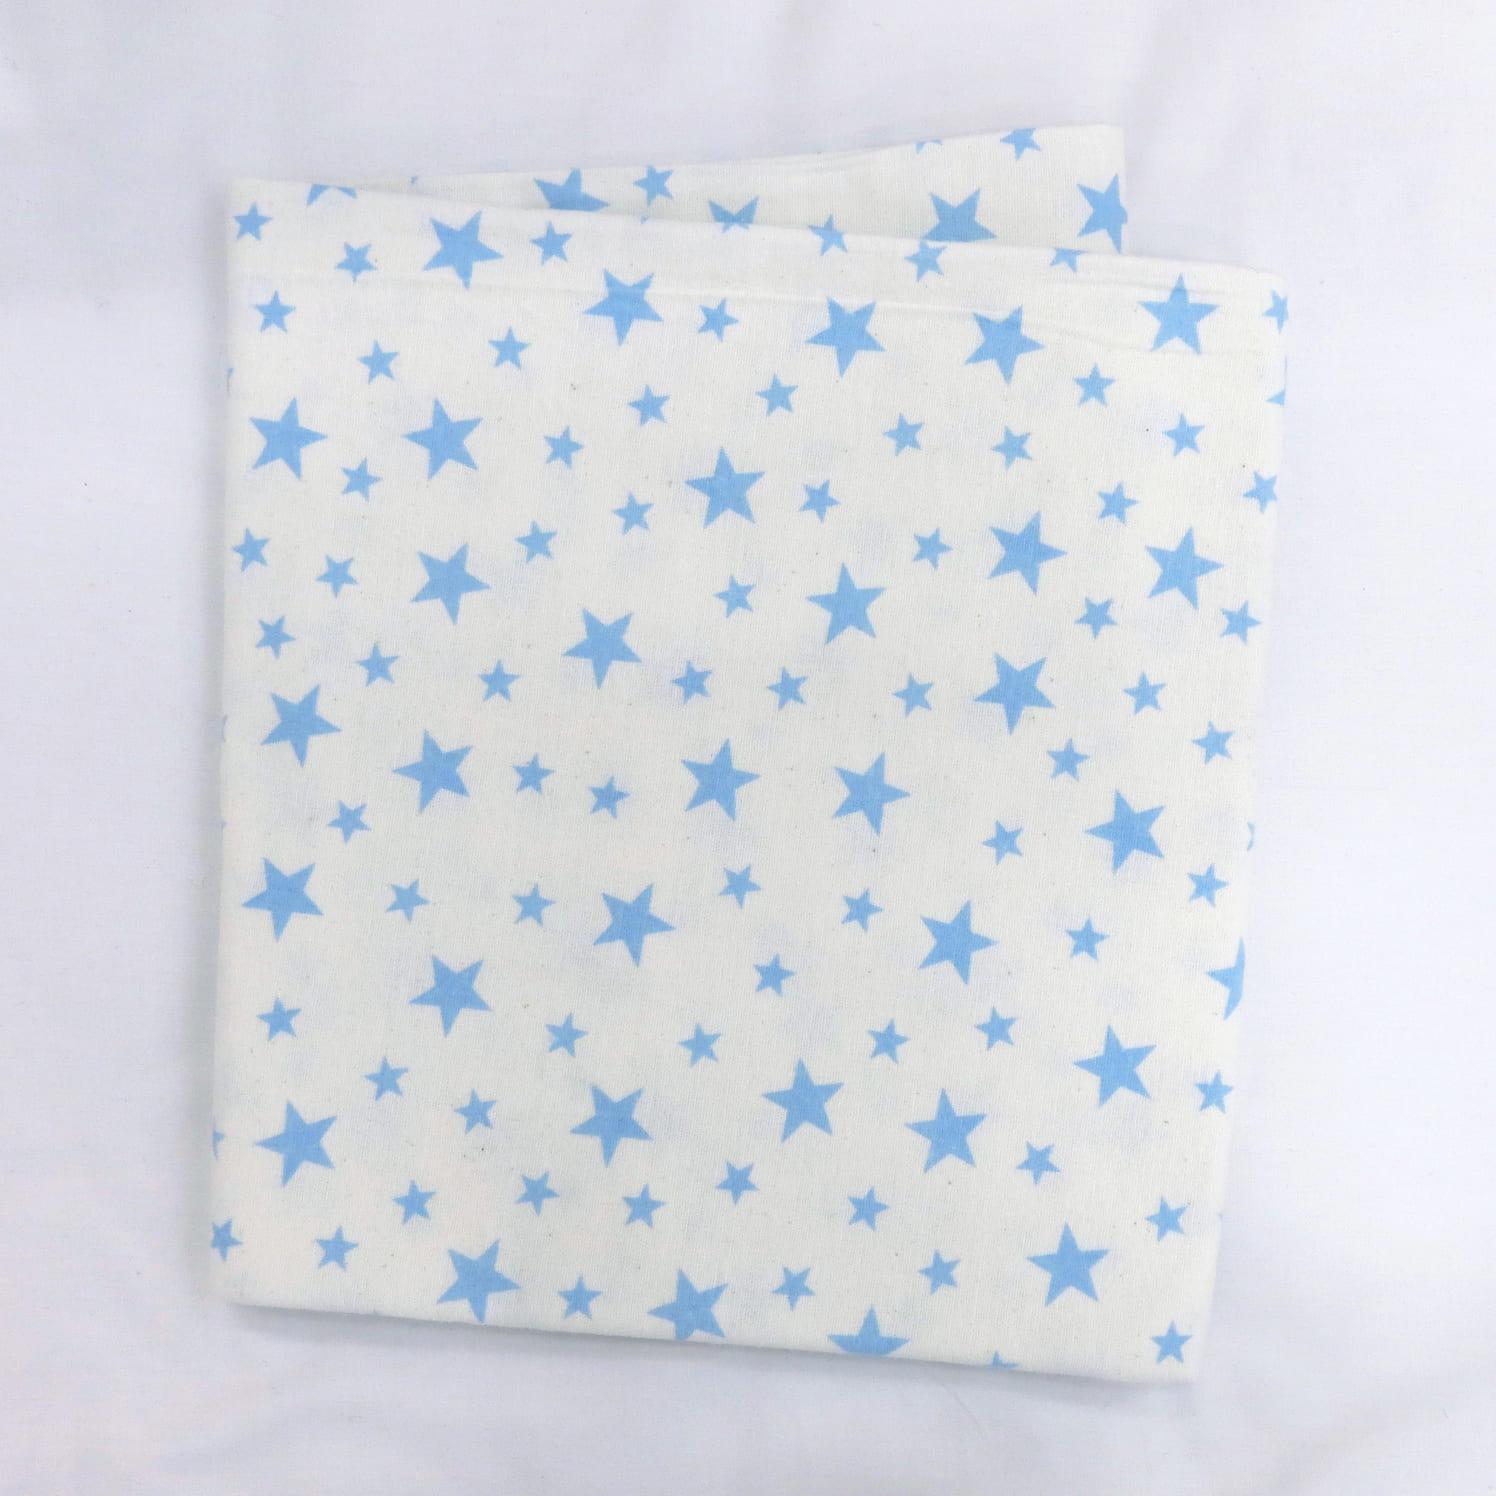 Фланелевая простыня 100х120 Синяя звездочка